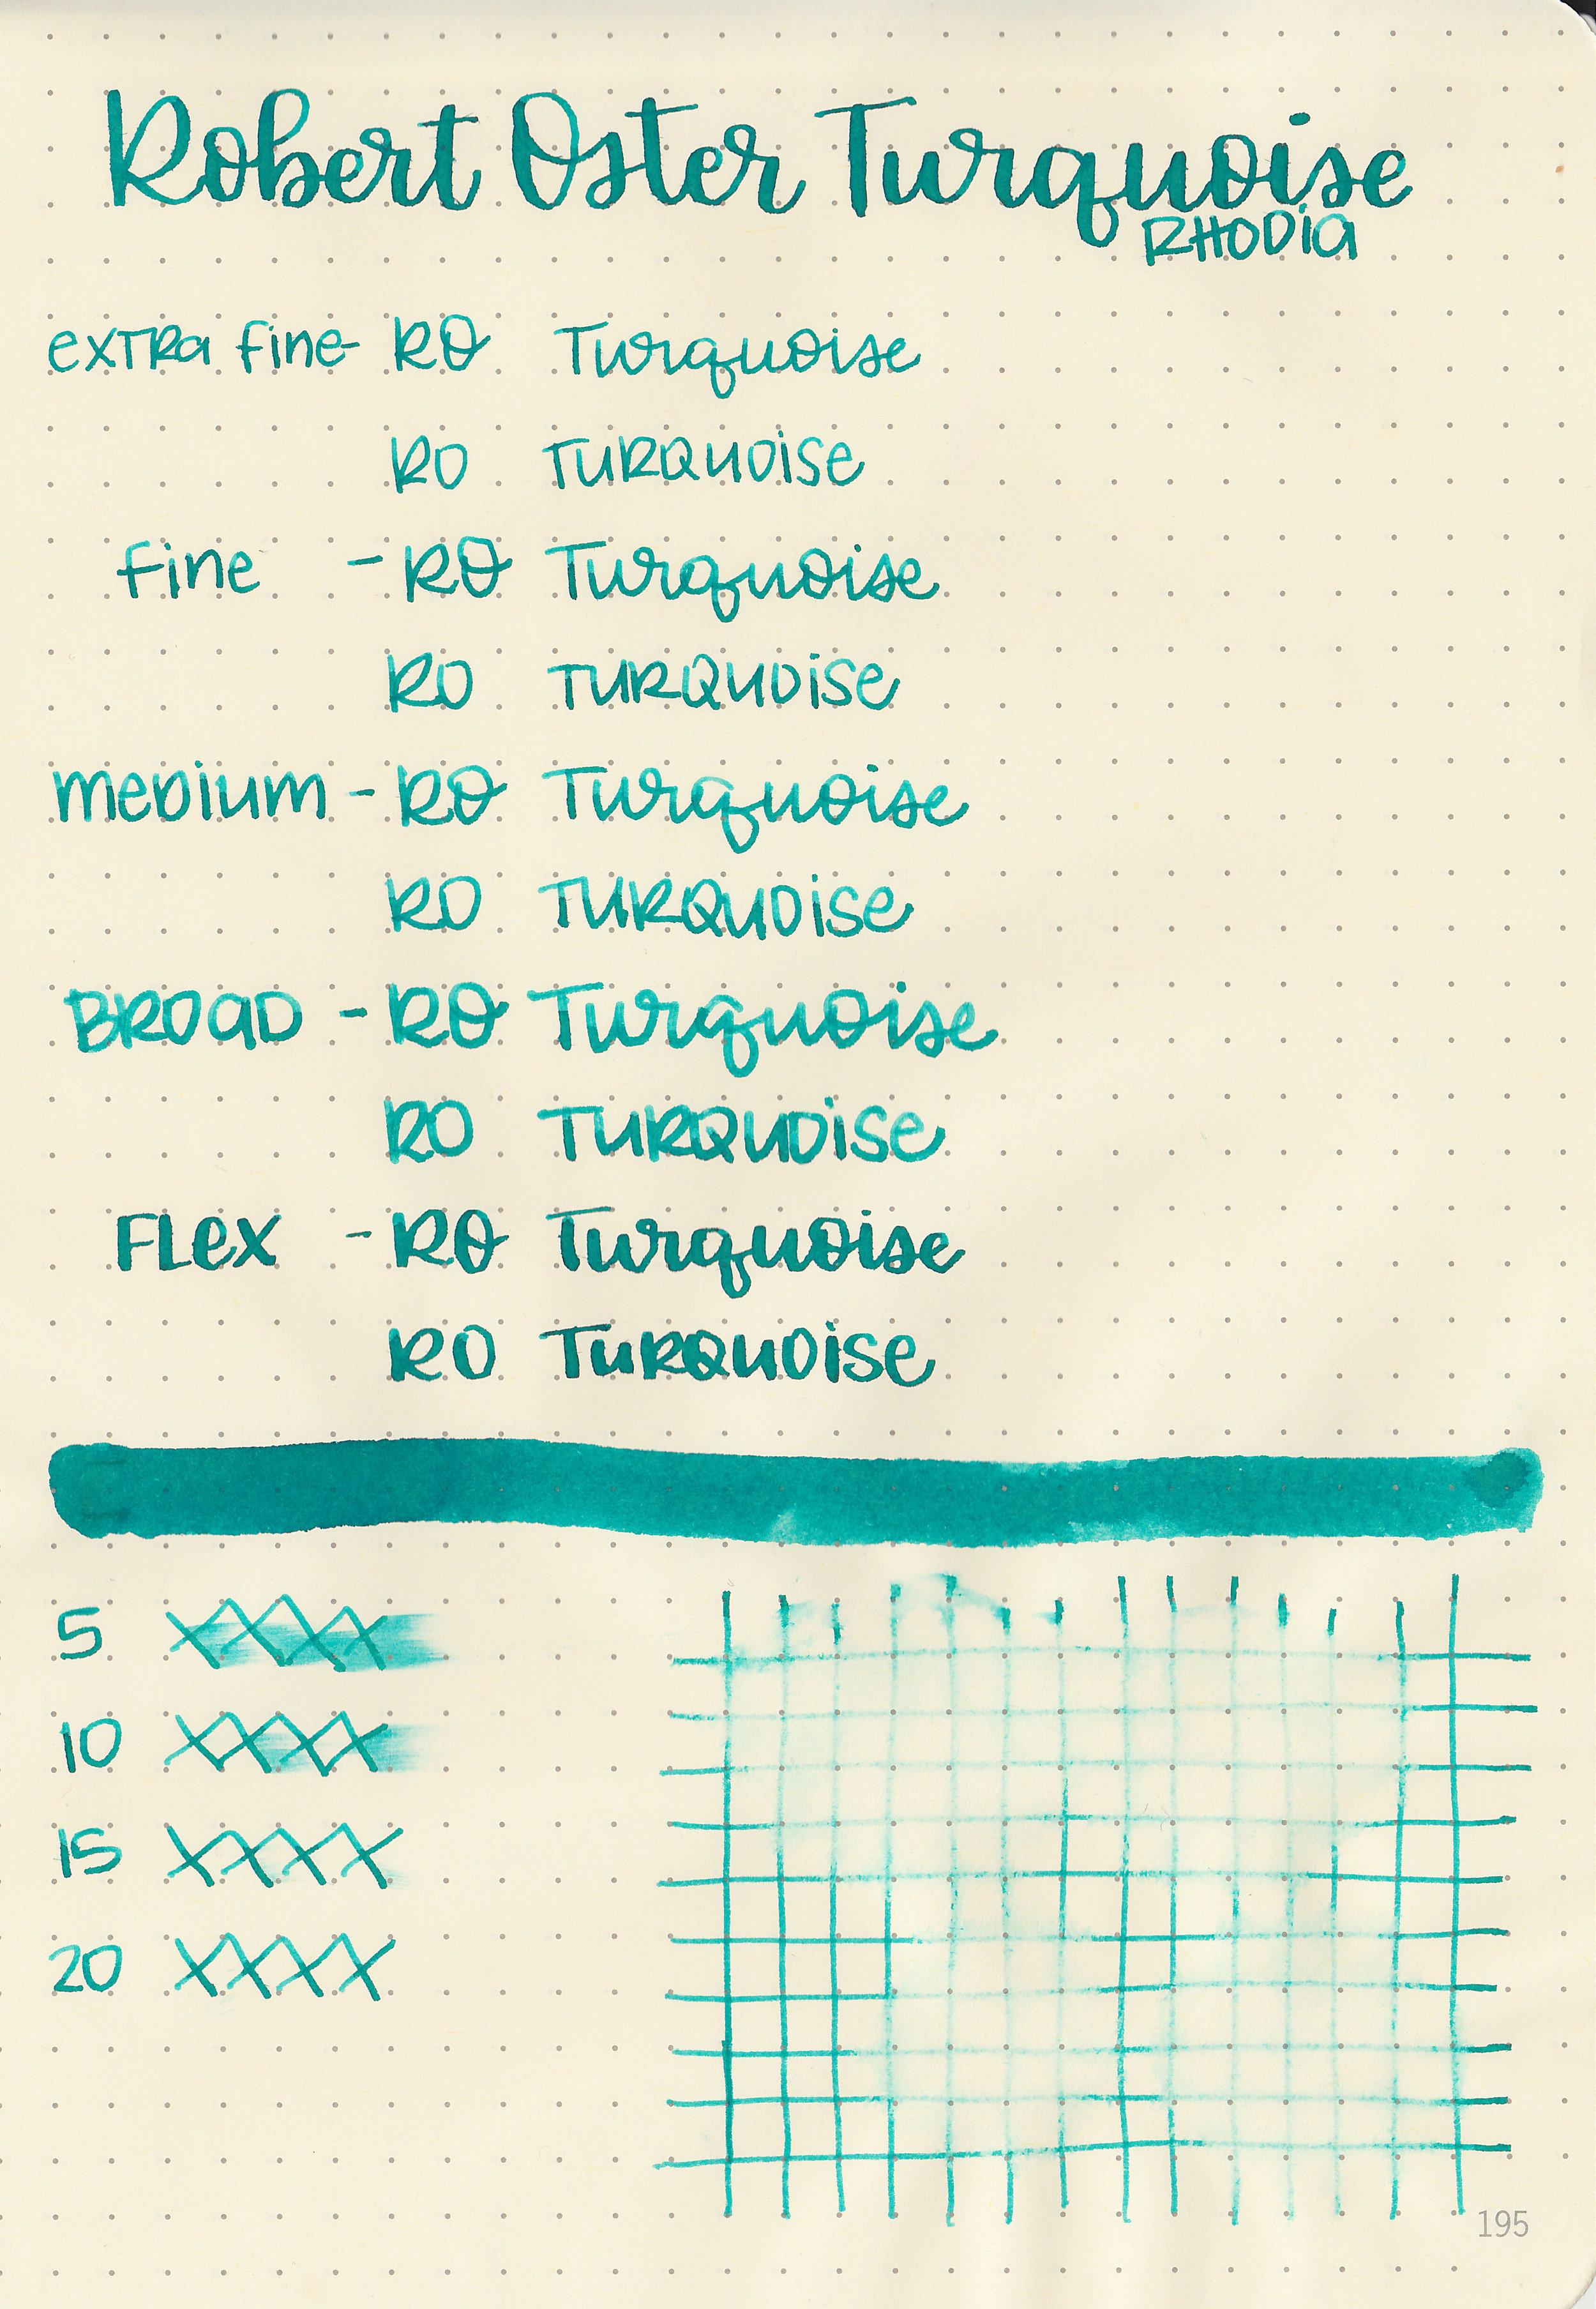 ro-turquoise-5.jpg